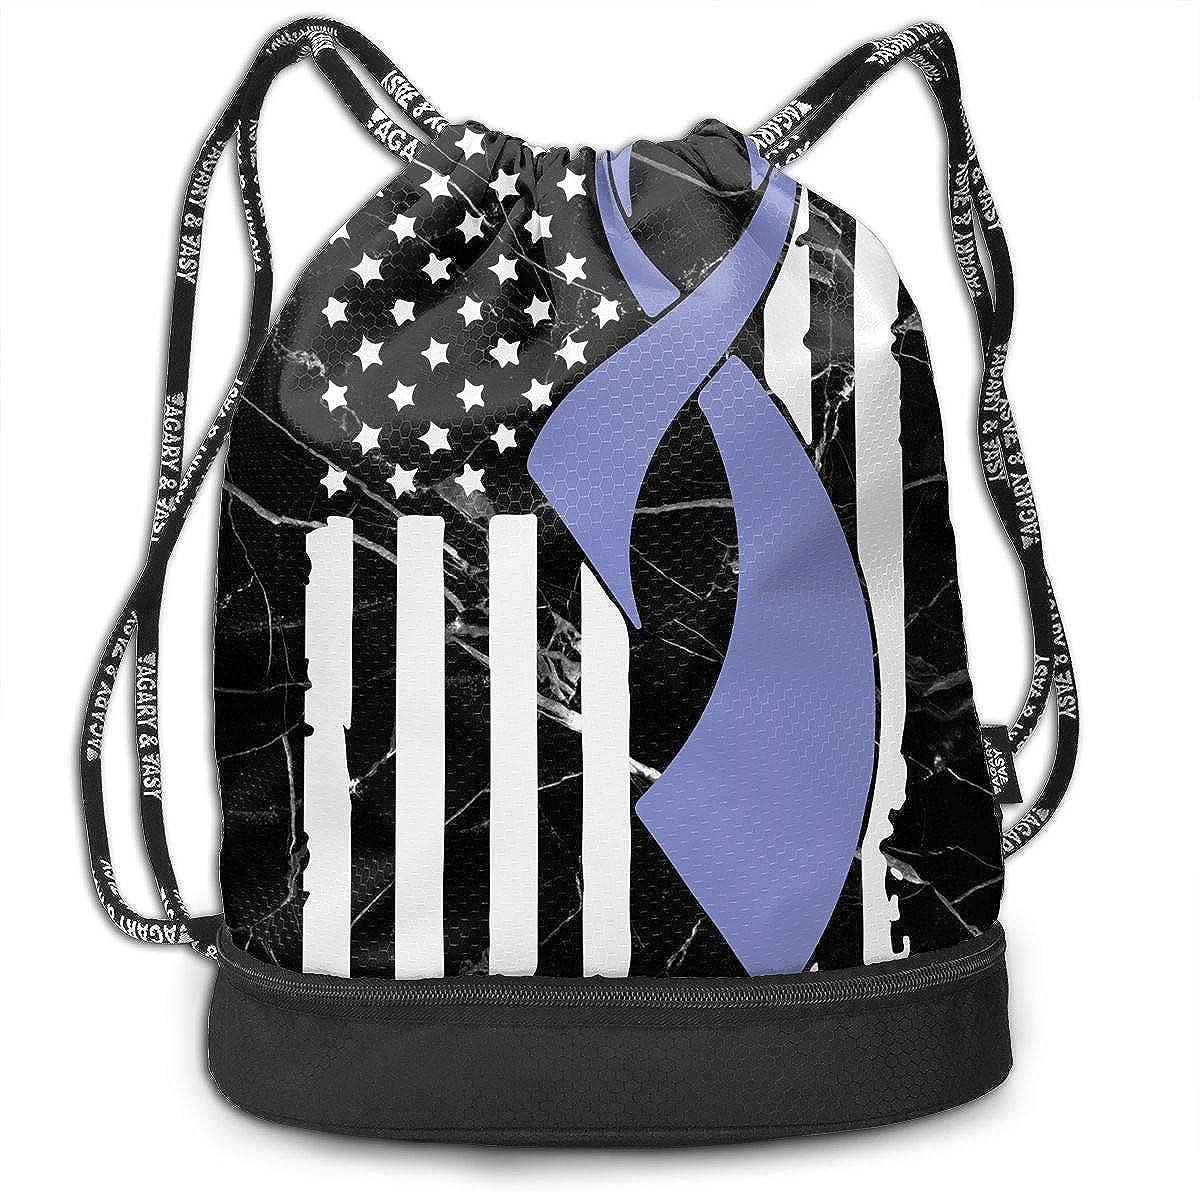 SG0HGO Drawstring Bag Stomach Cancer Awareness Flag-1 Men Women Gym Sport Yoga Rucksack Shoulder Bags